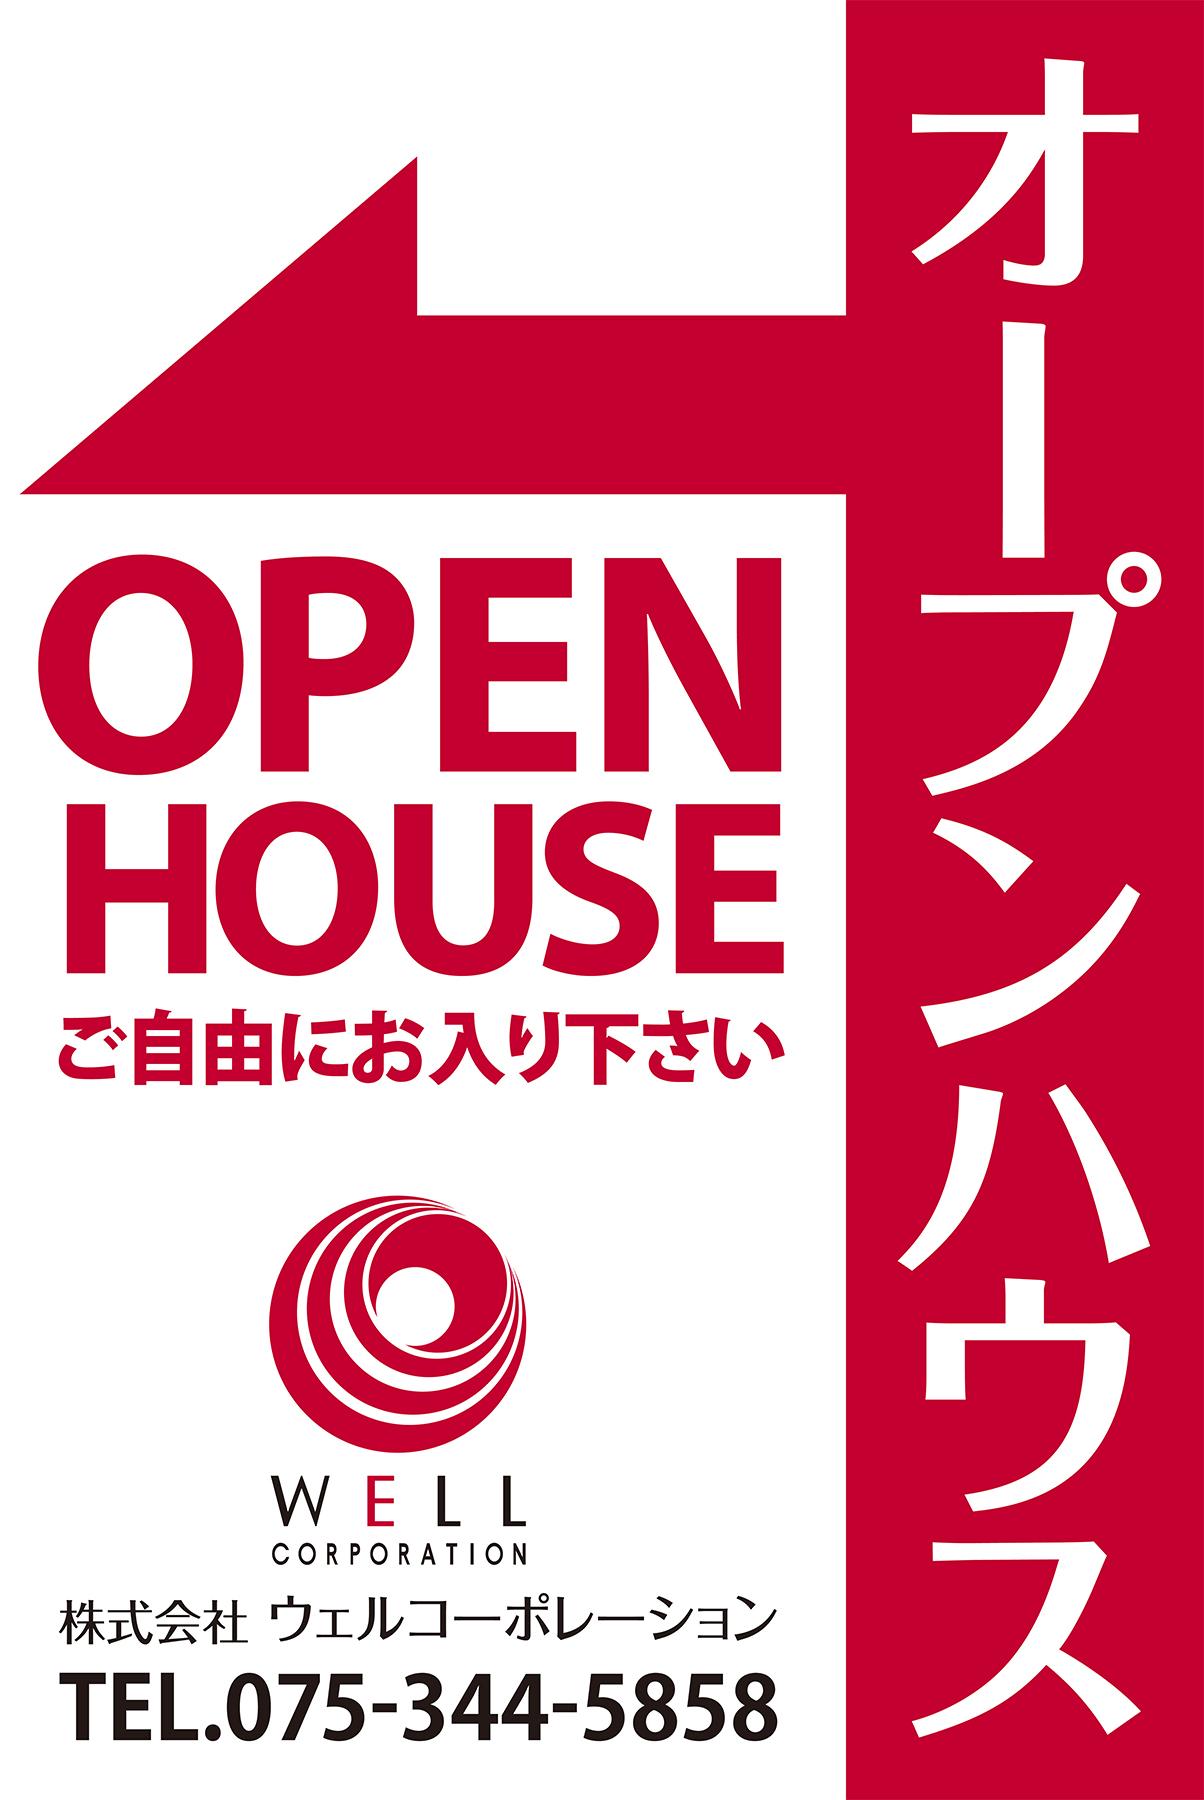 A型看板-オープンハウス 反対面